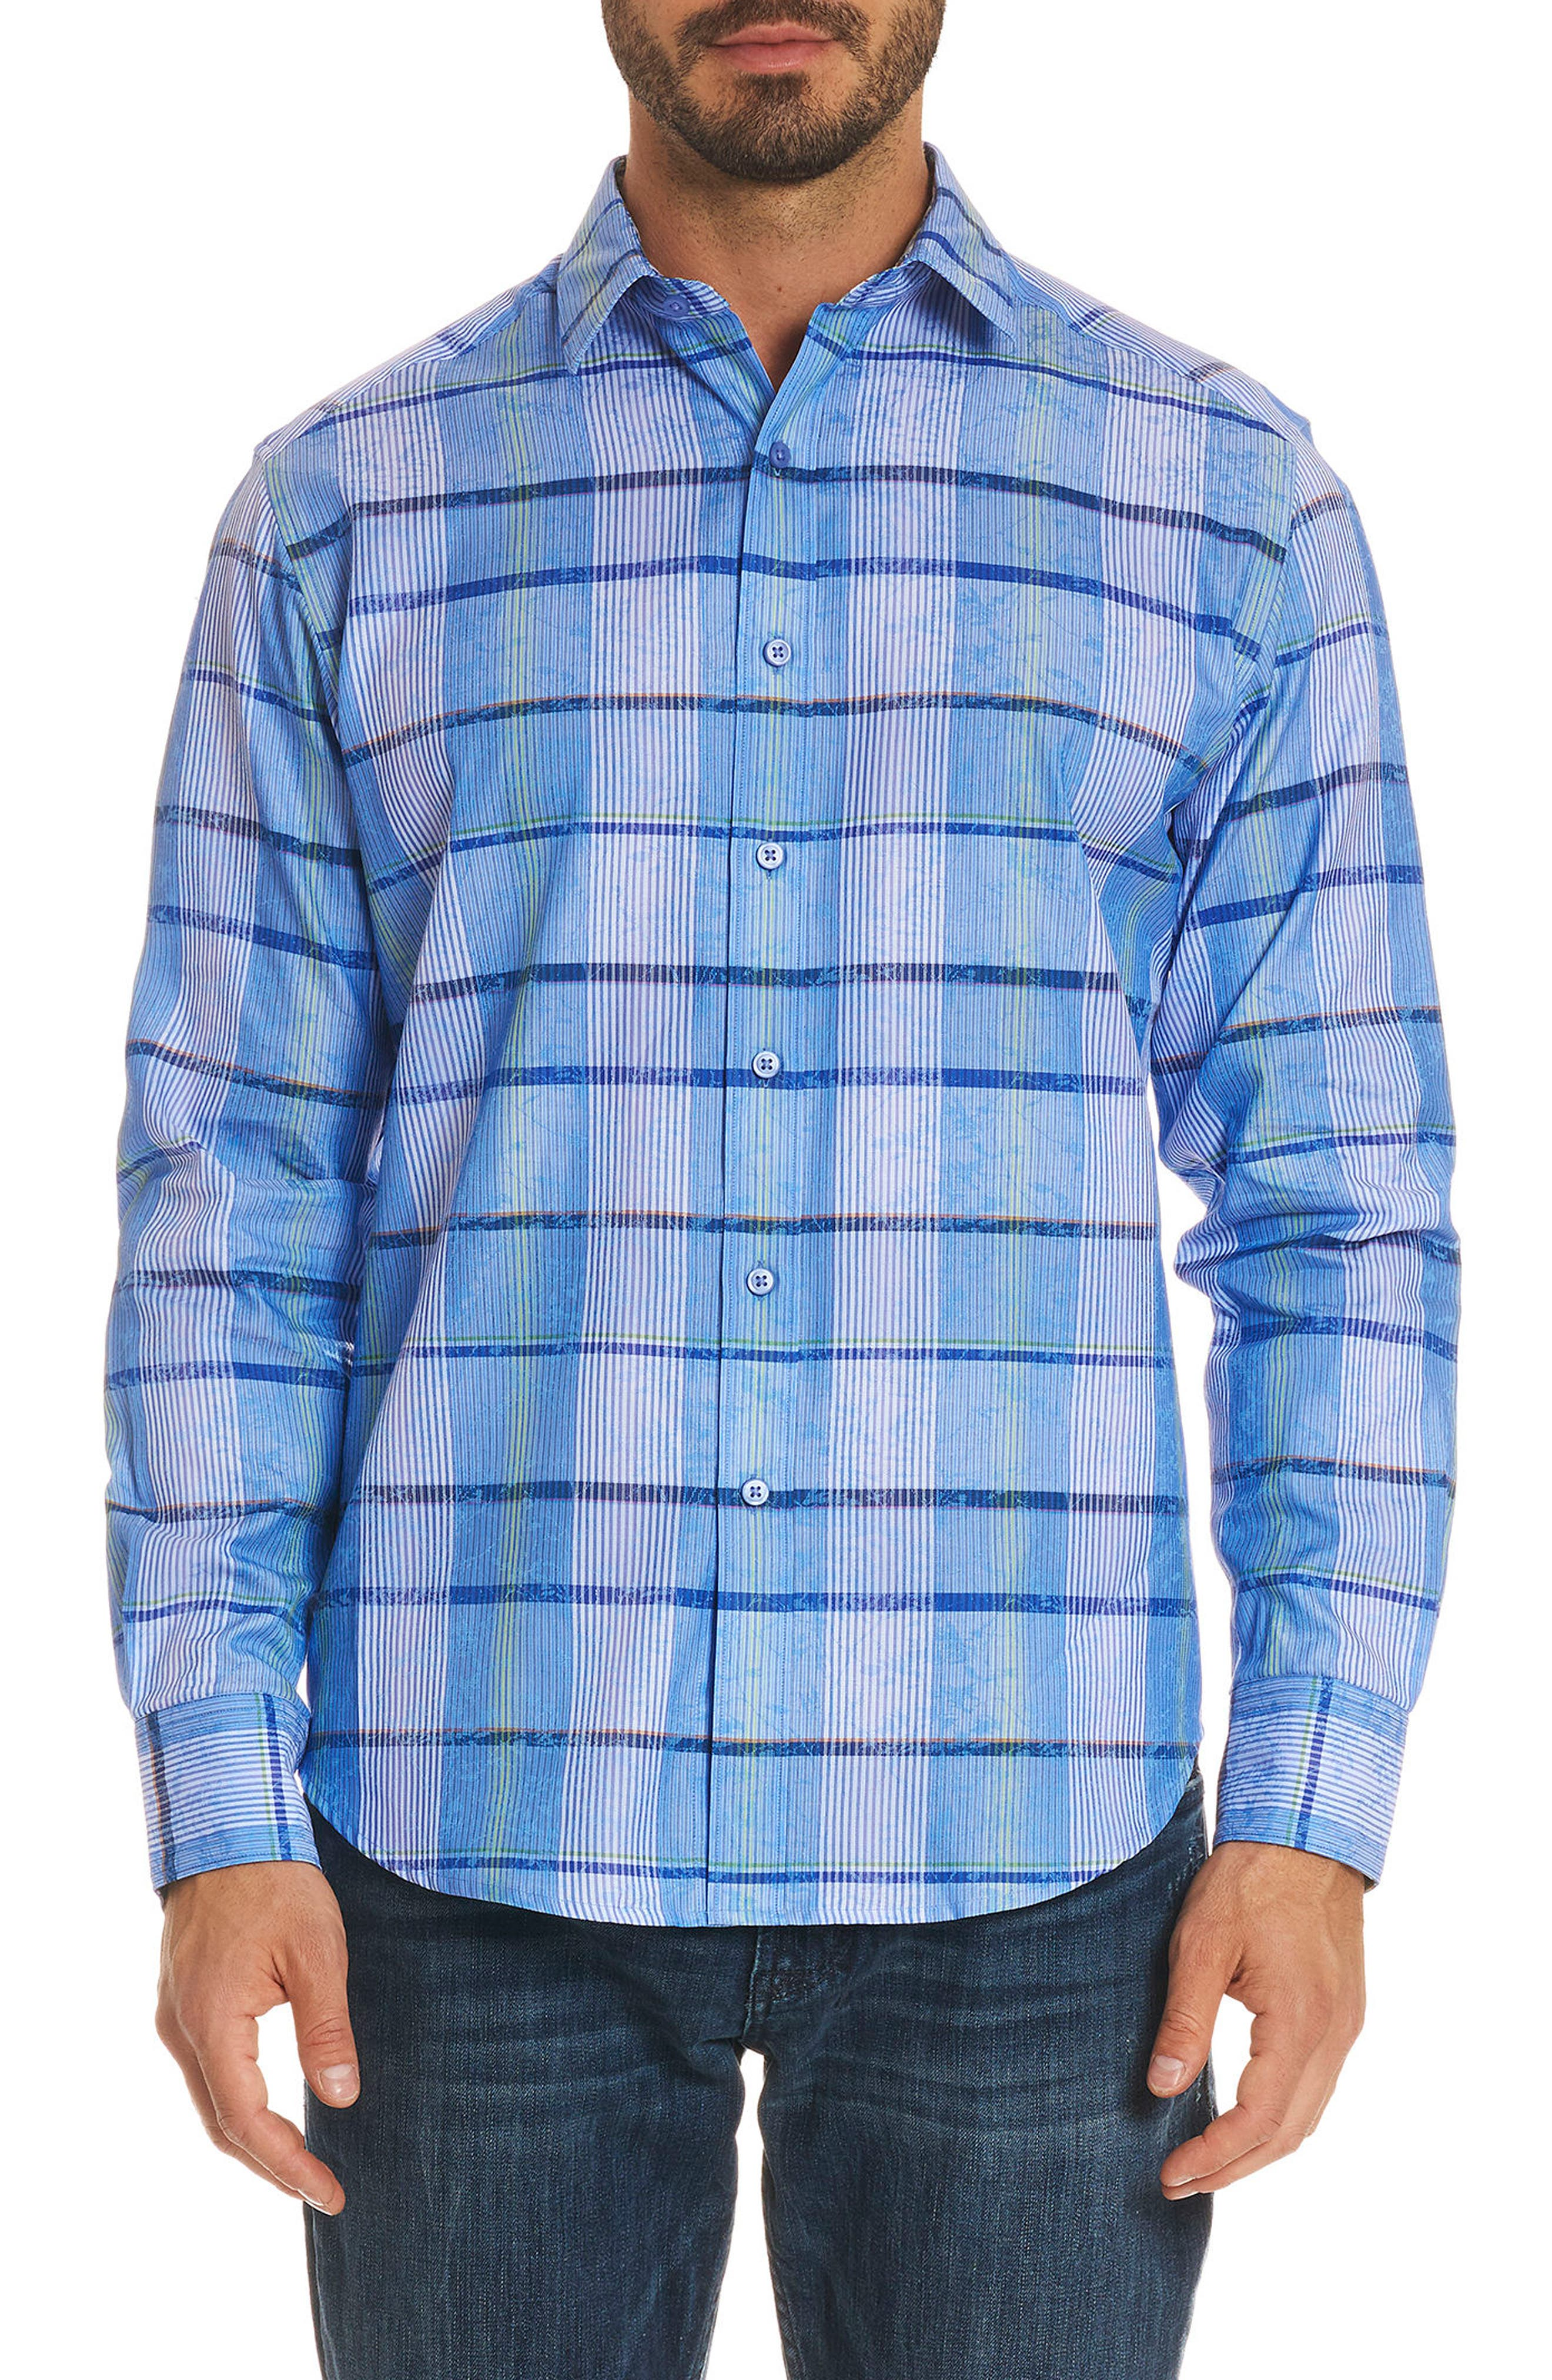 Ferro Classic Fit Sport Shirt,                         Main,                         color, 400